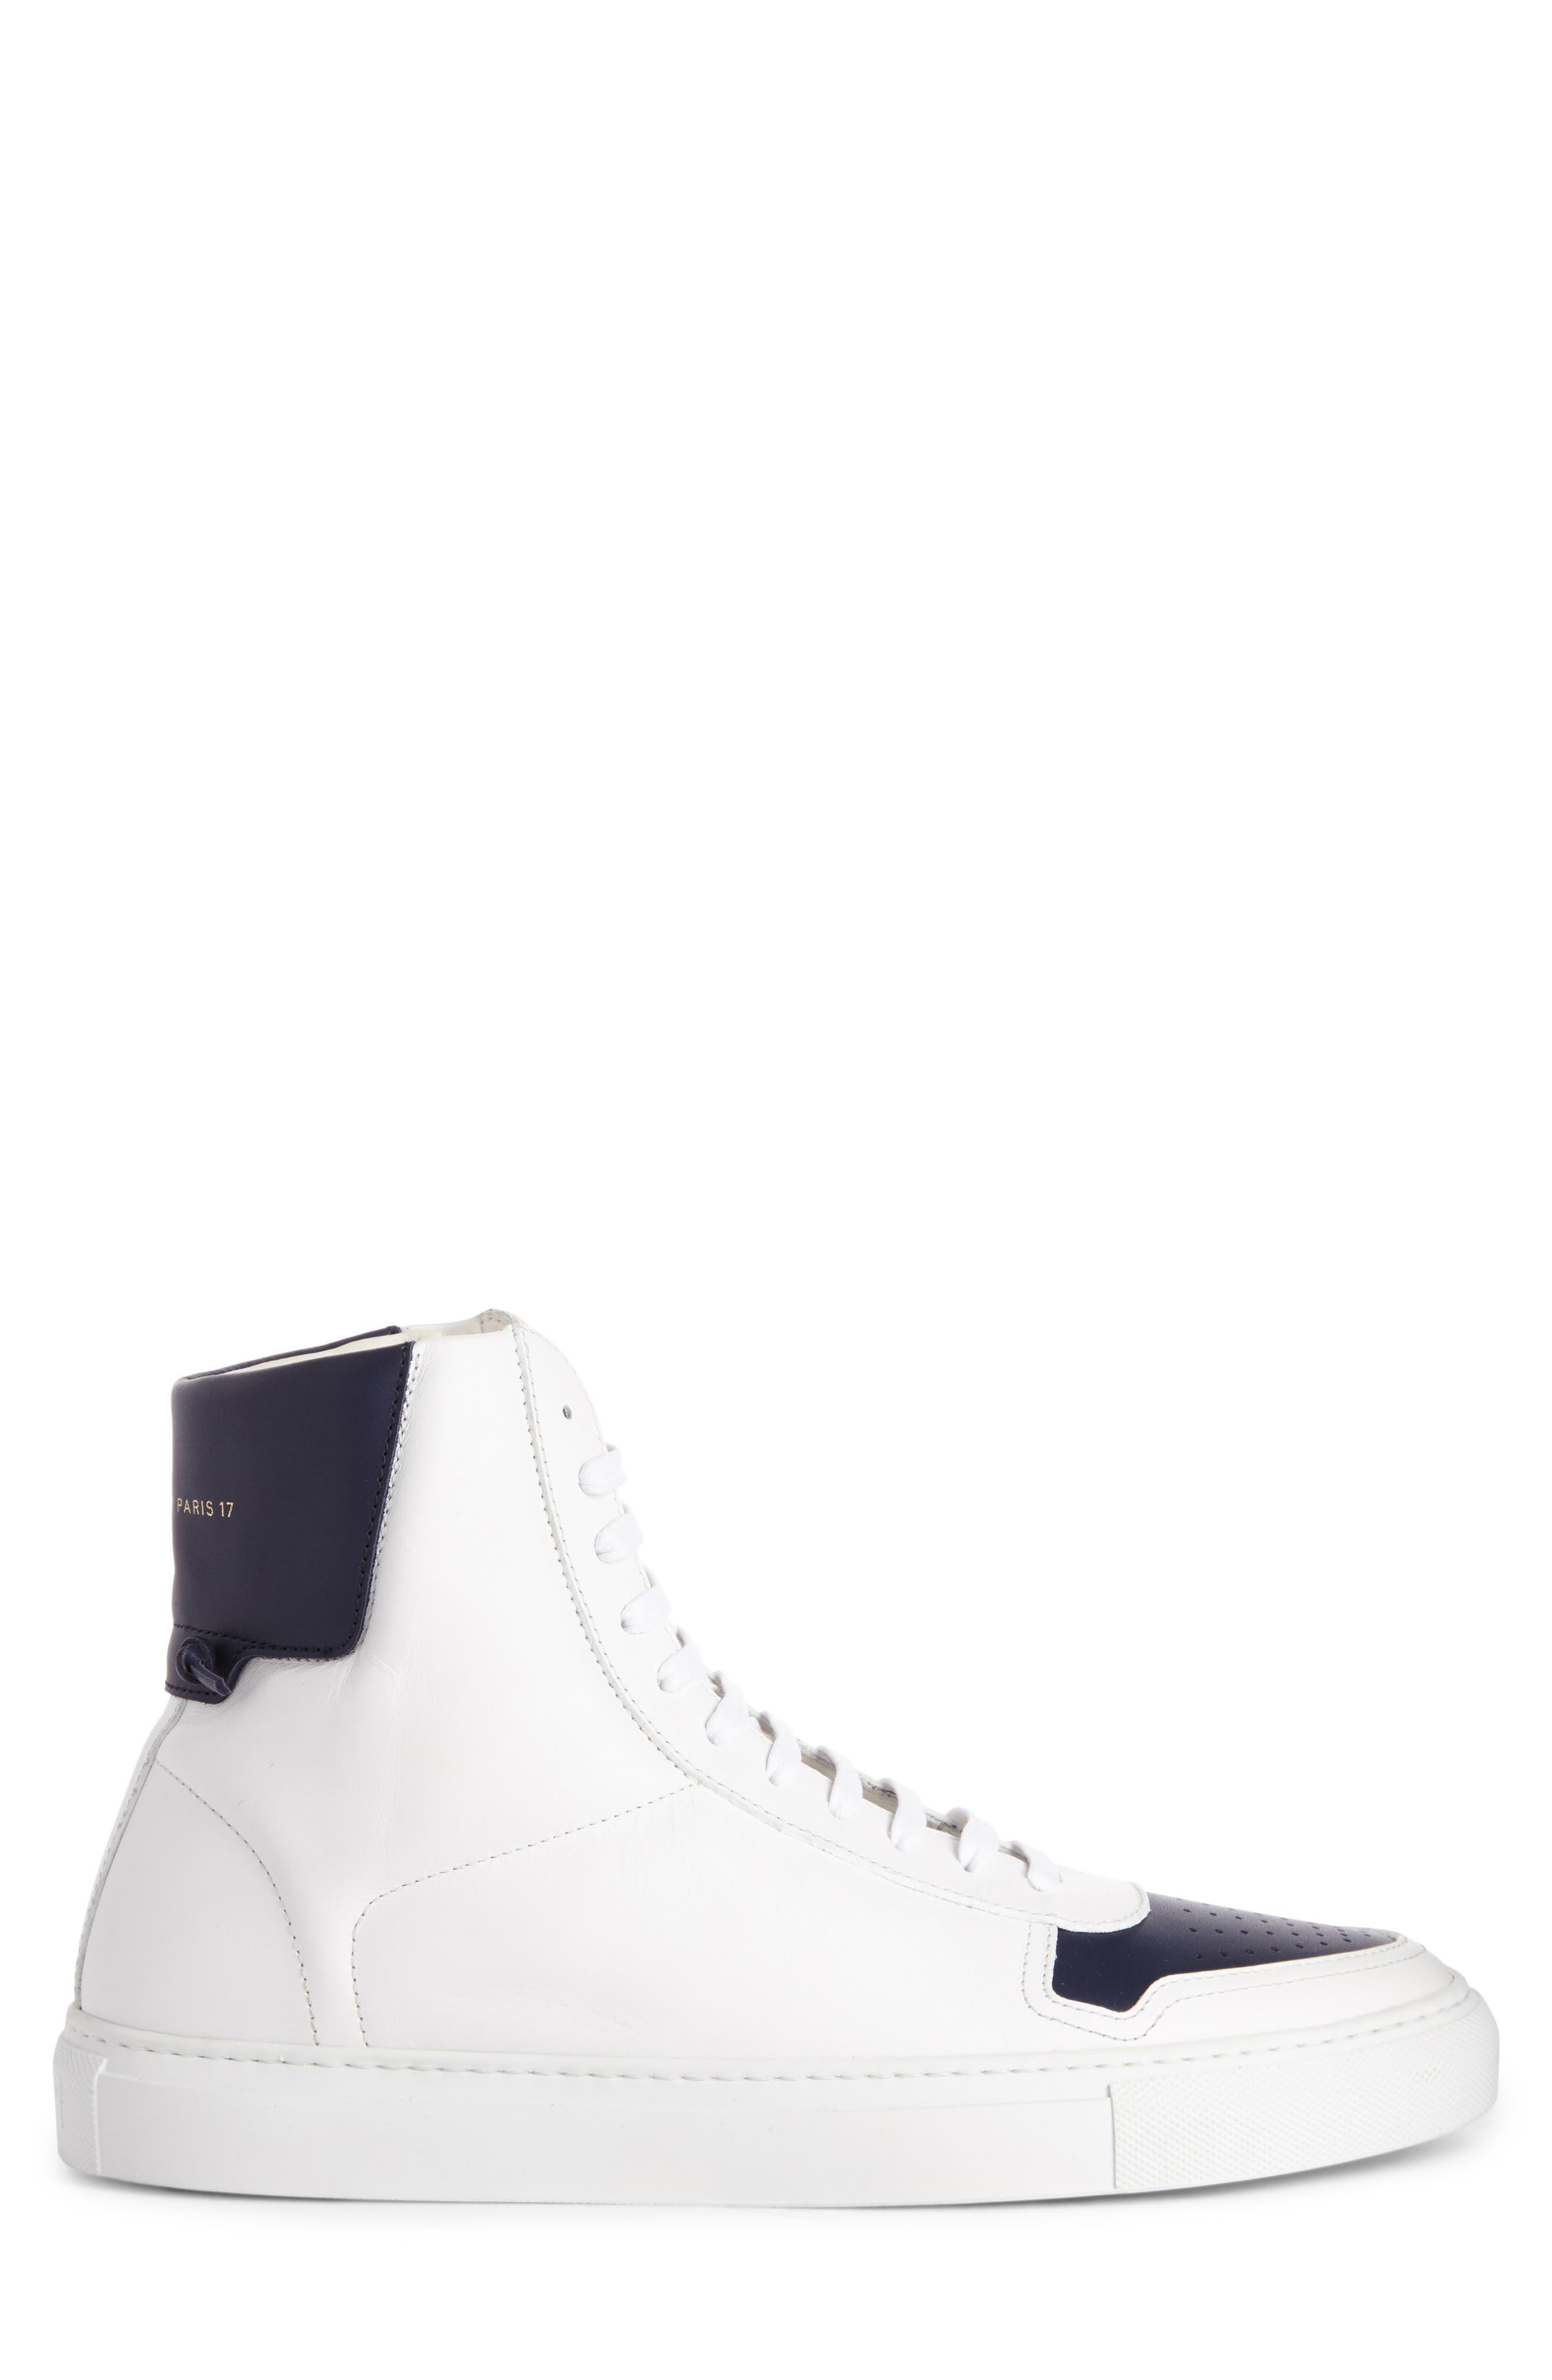 High Top Sneaker,                             Alternate thumbnail 3, color,                             131